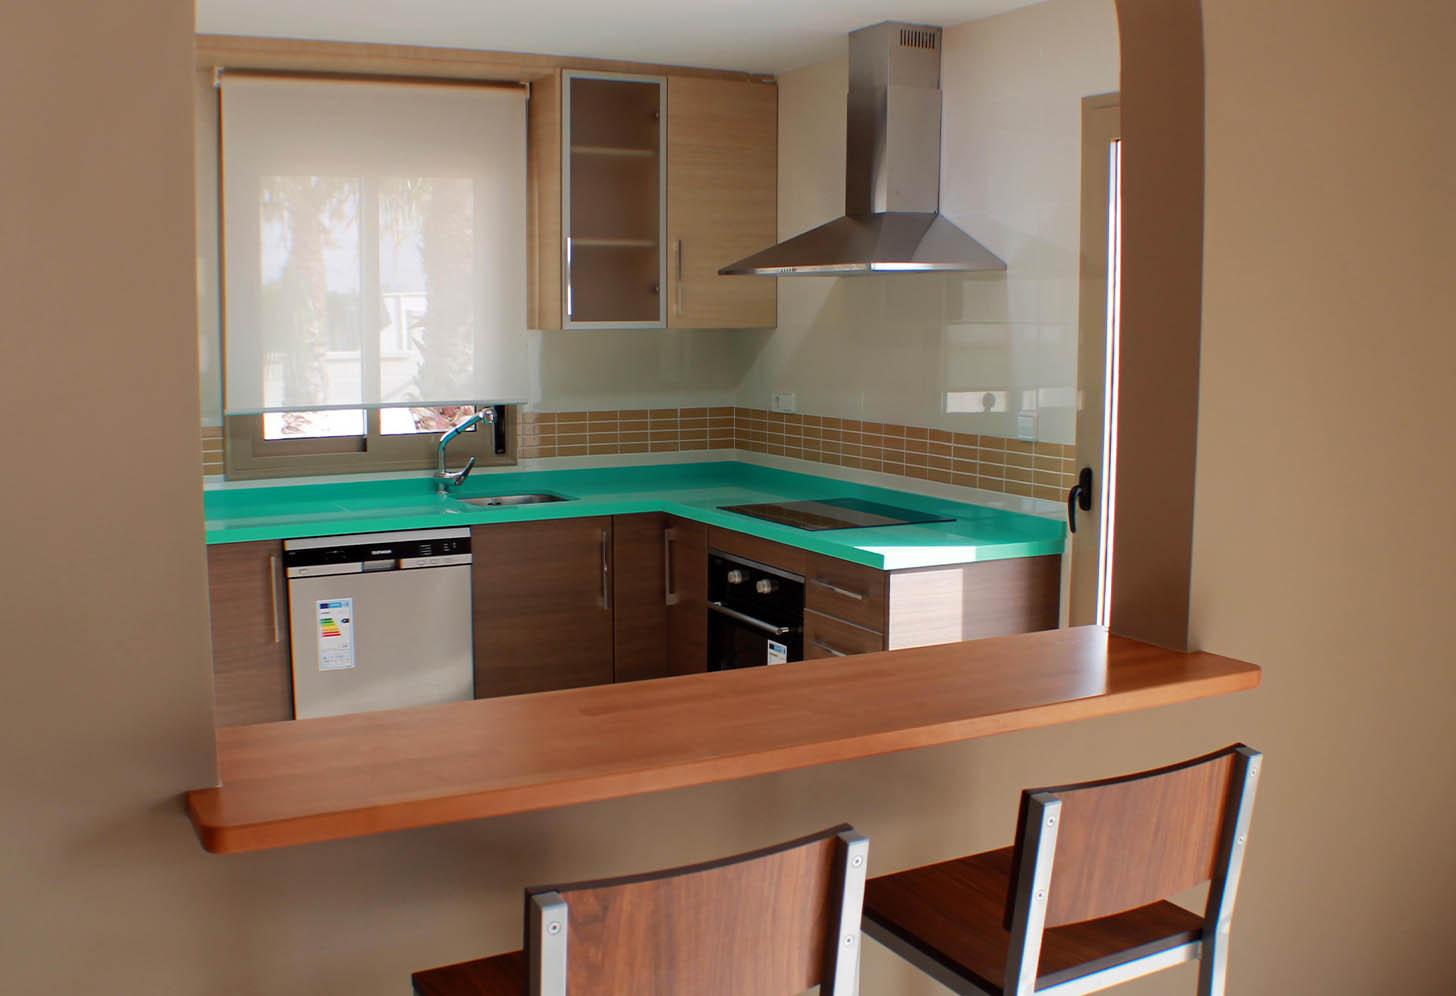 immobilier neuf espagne costa blanca on-d10 la isla villas cuisine